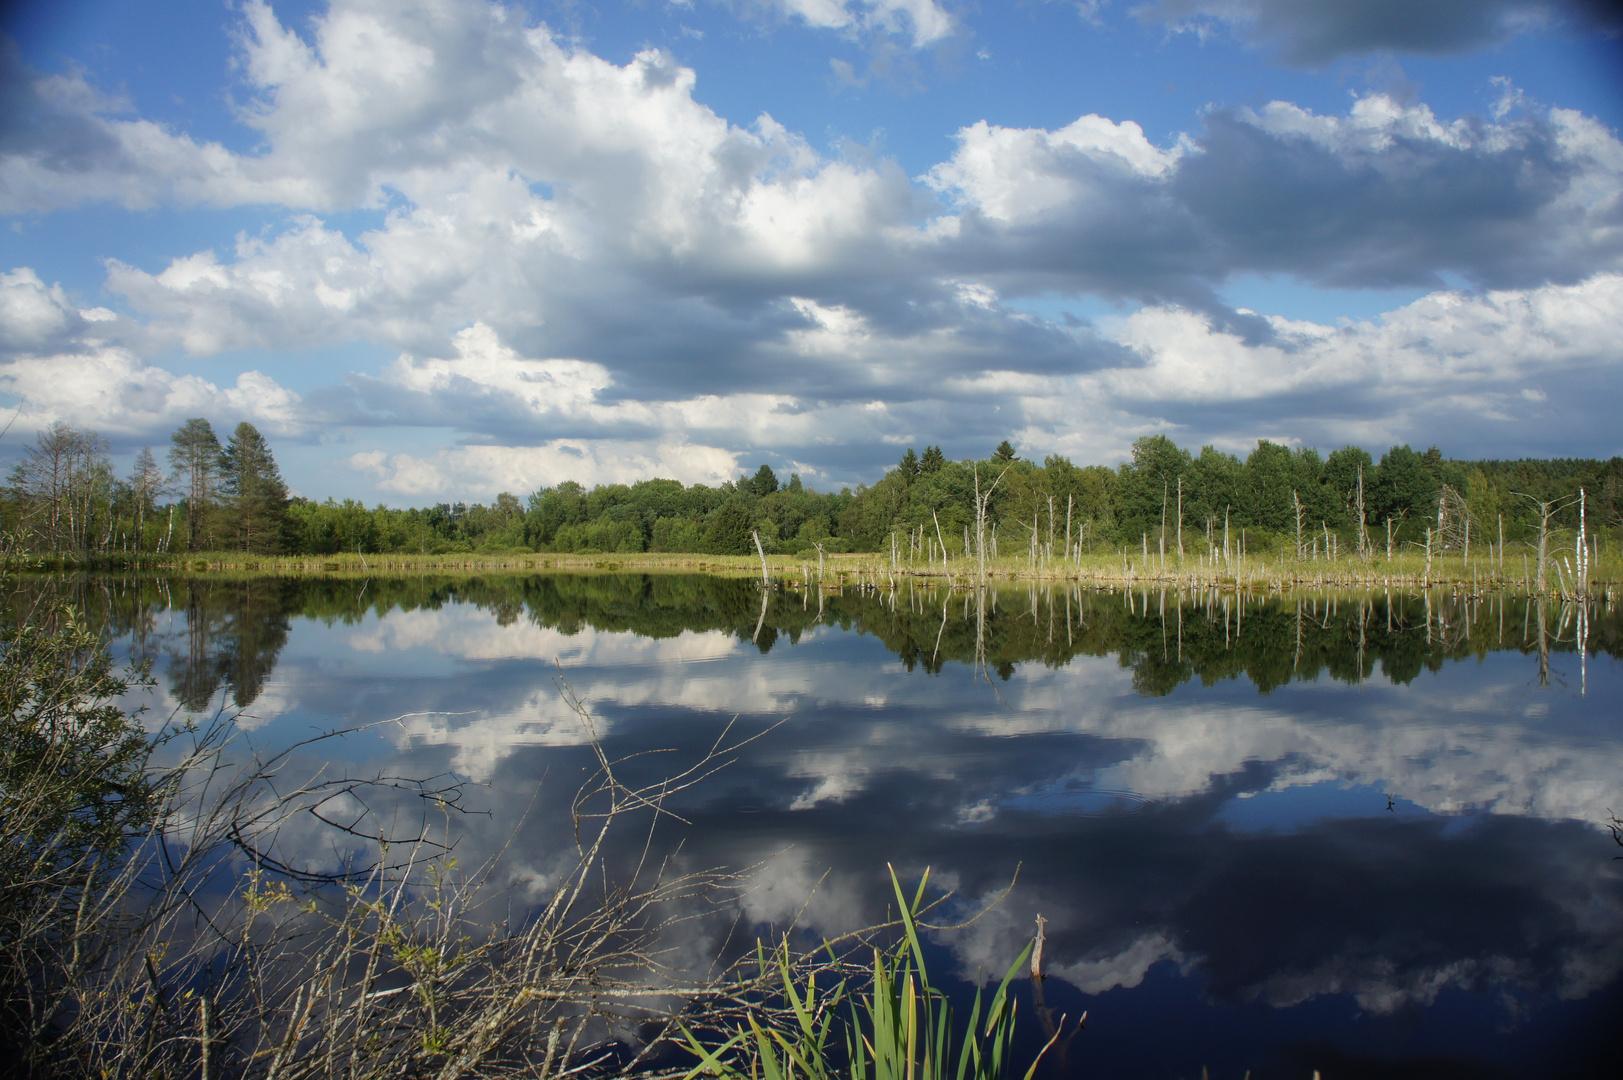 Unser Moos des Neckars Ursprung